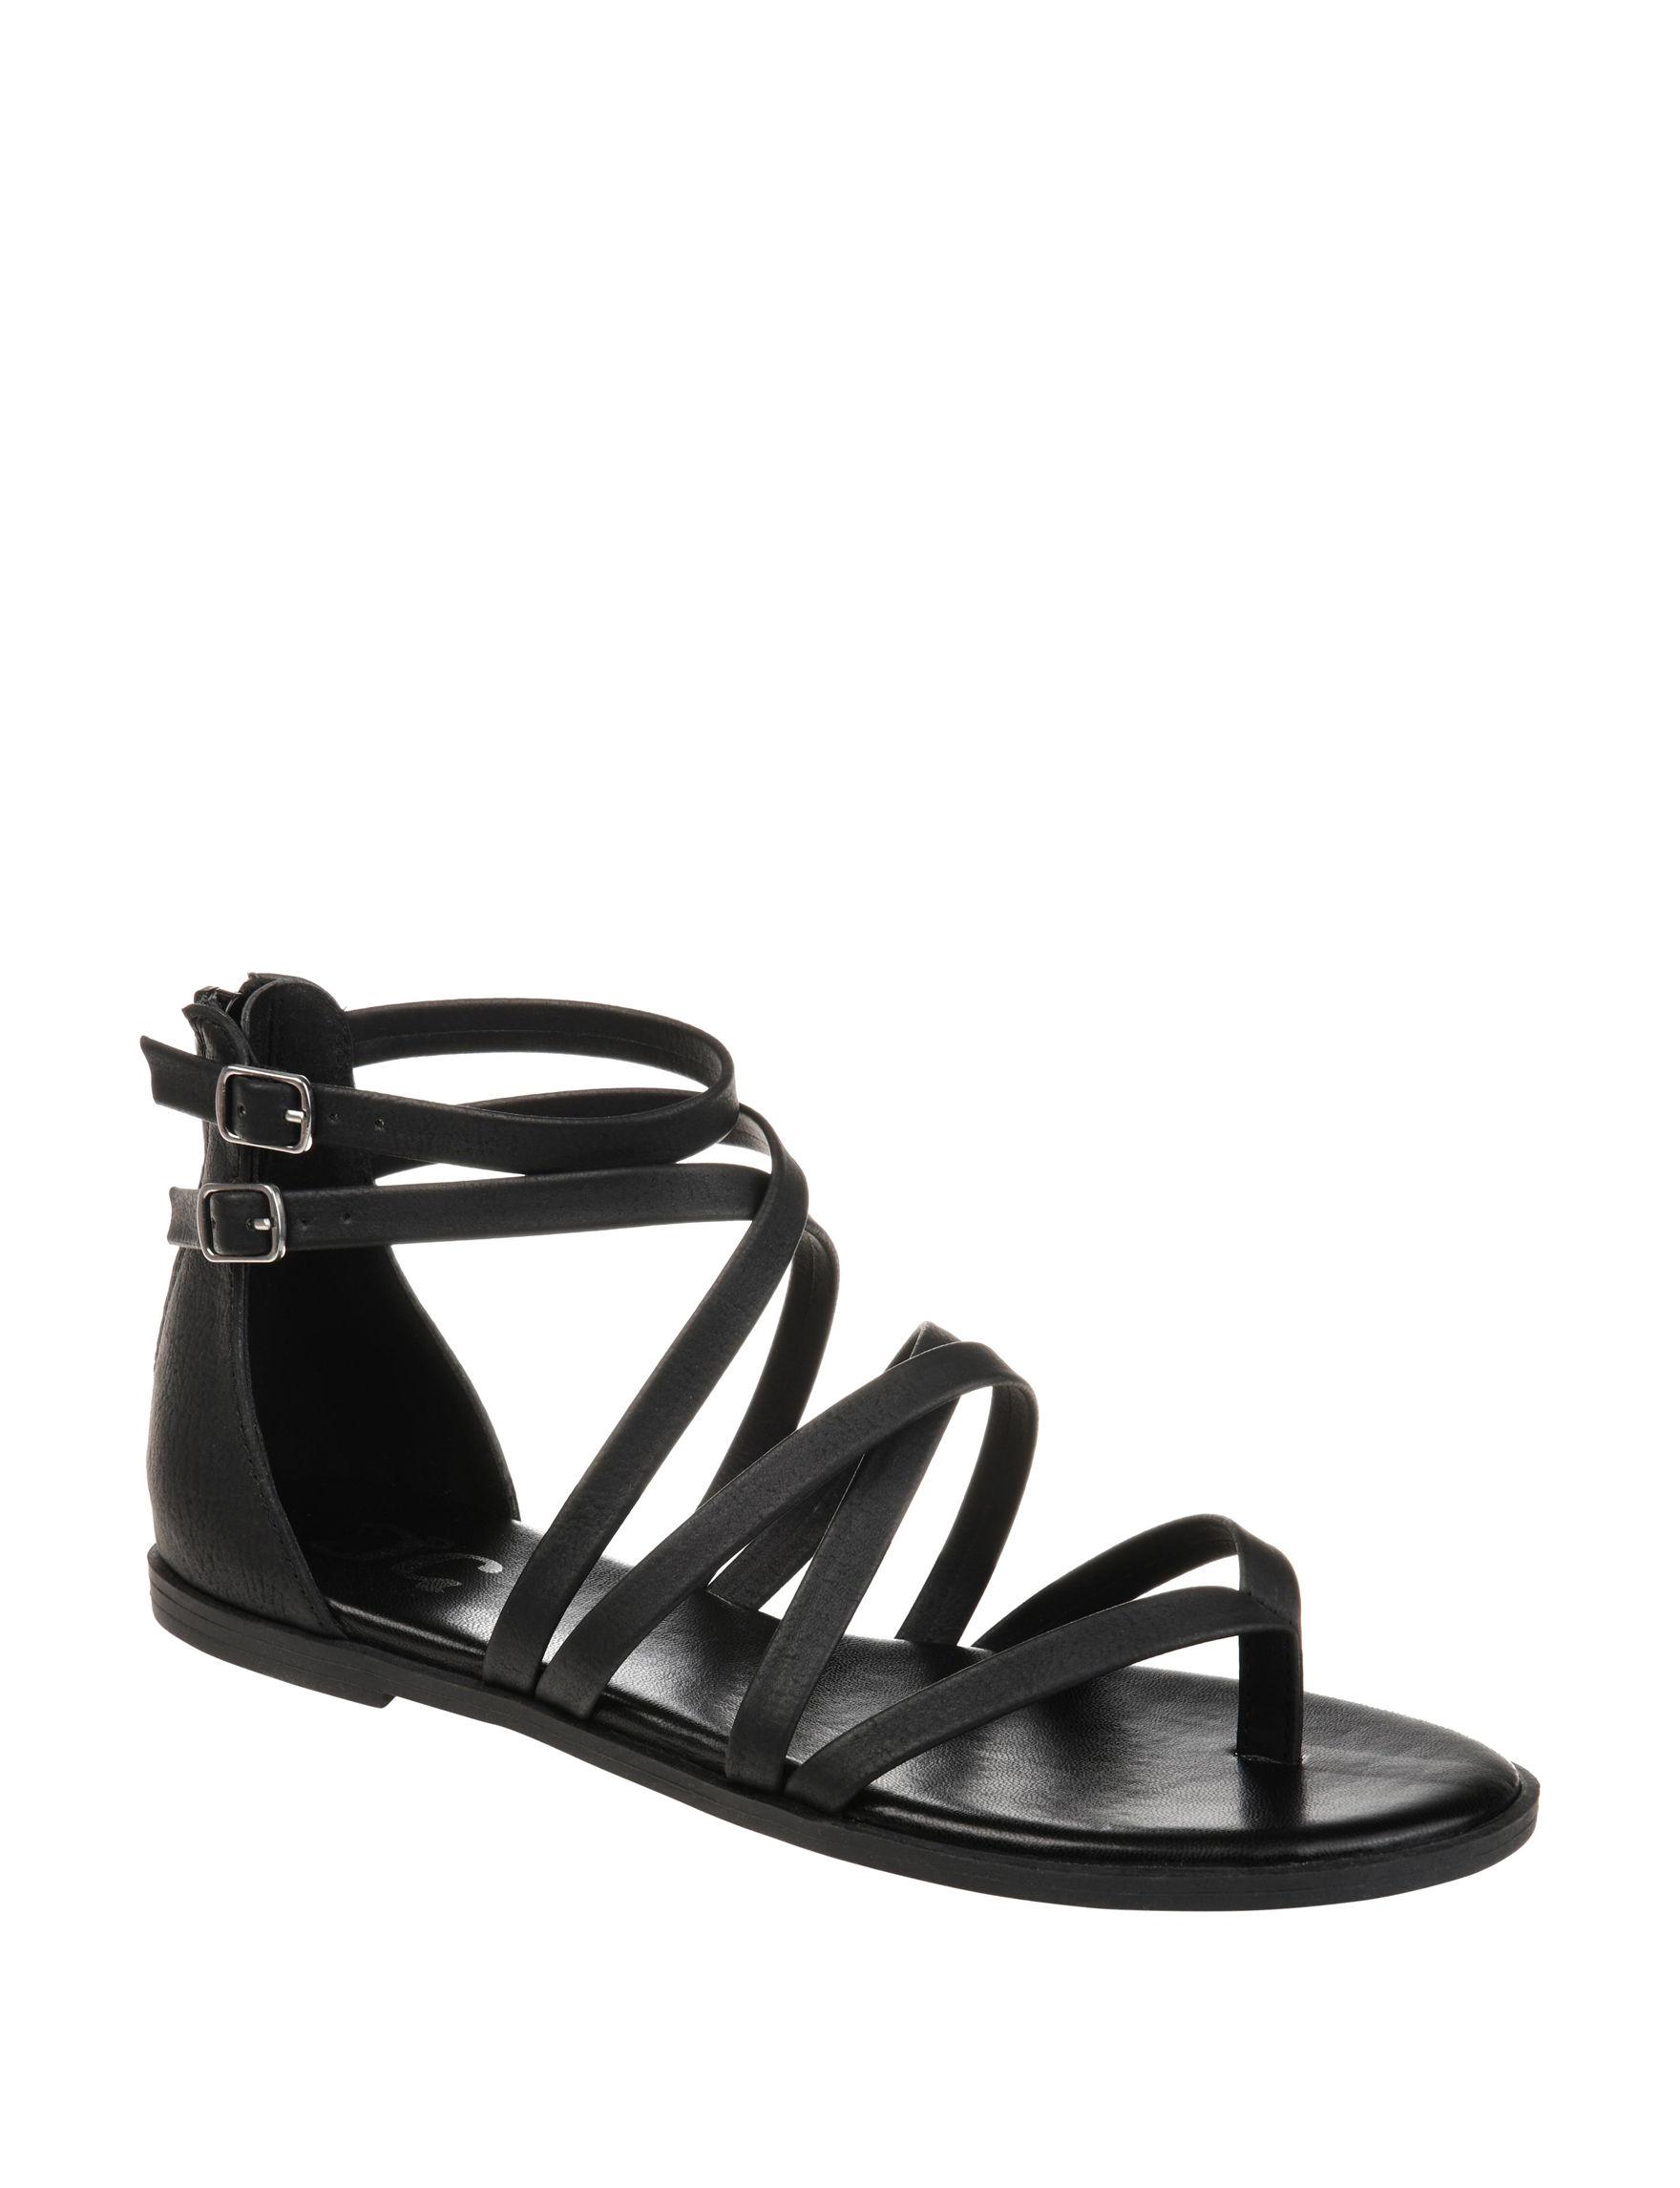 2e336e1bbb33 Journee Collection Women s Zailie Gladiator Sandals